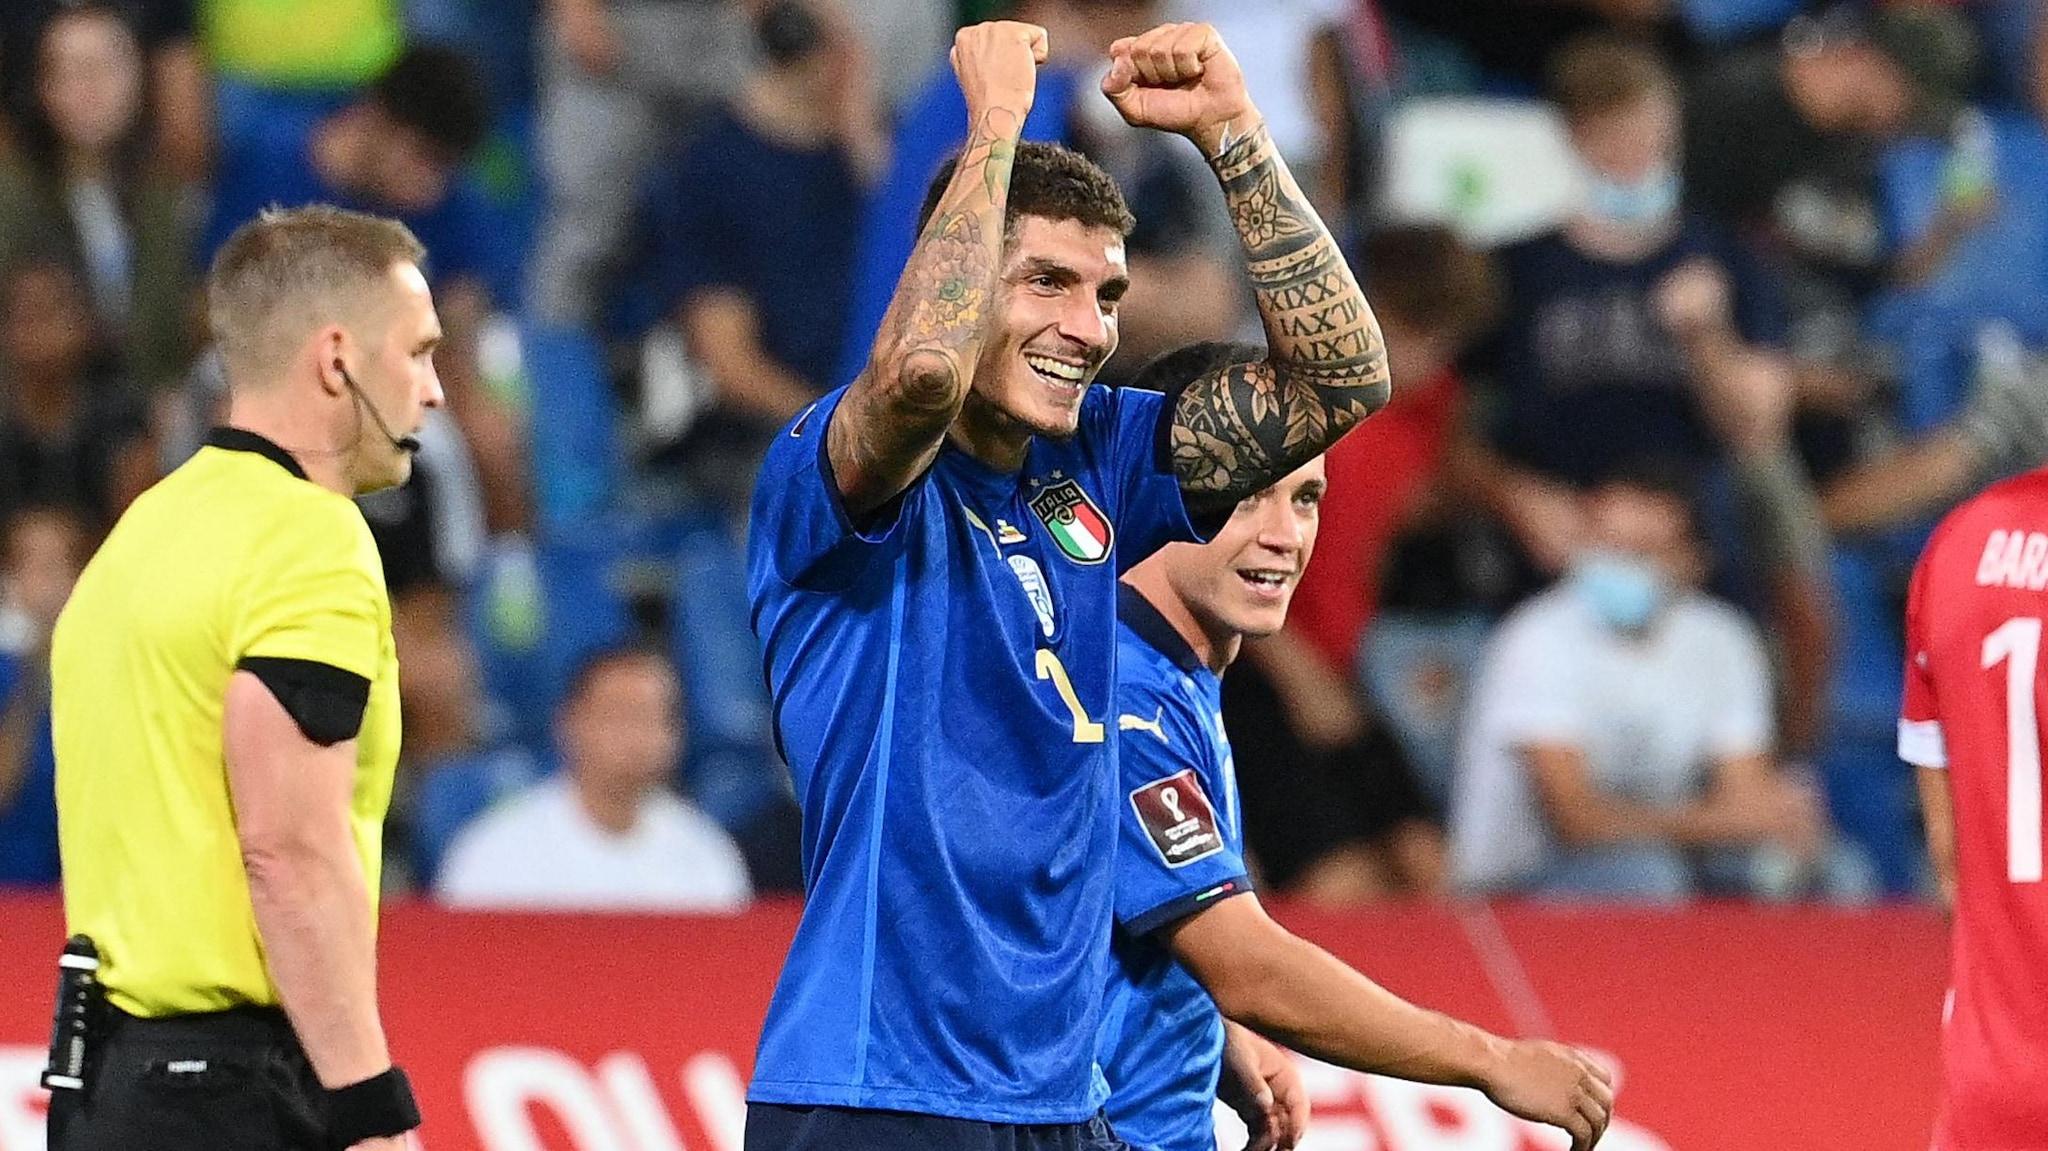 European Qualifiers: Italy, Germany purr, England hauled back - UEFA.com